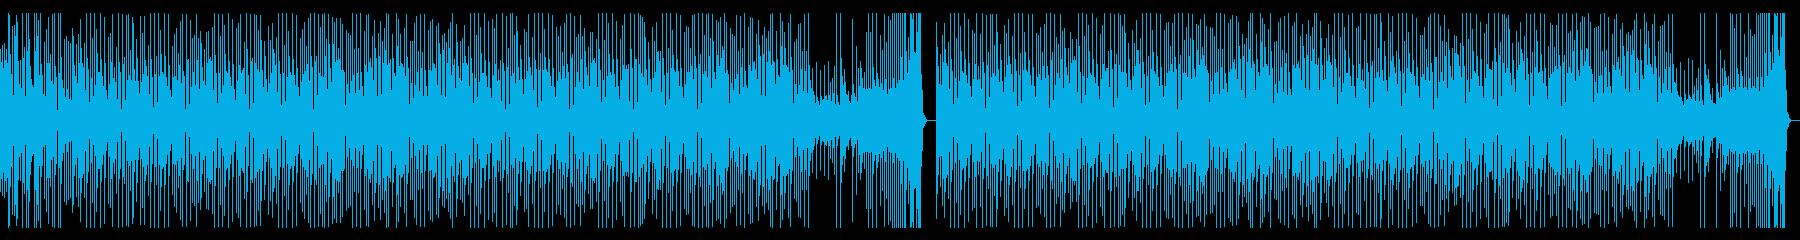 It is a refreshing BGM of Shibuya-kei.'s reproduced waveform